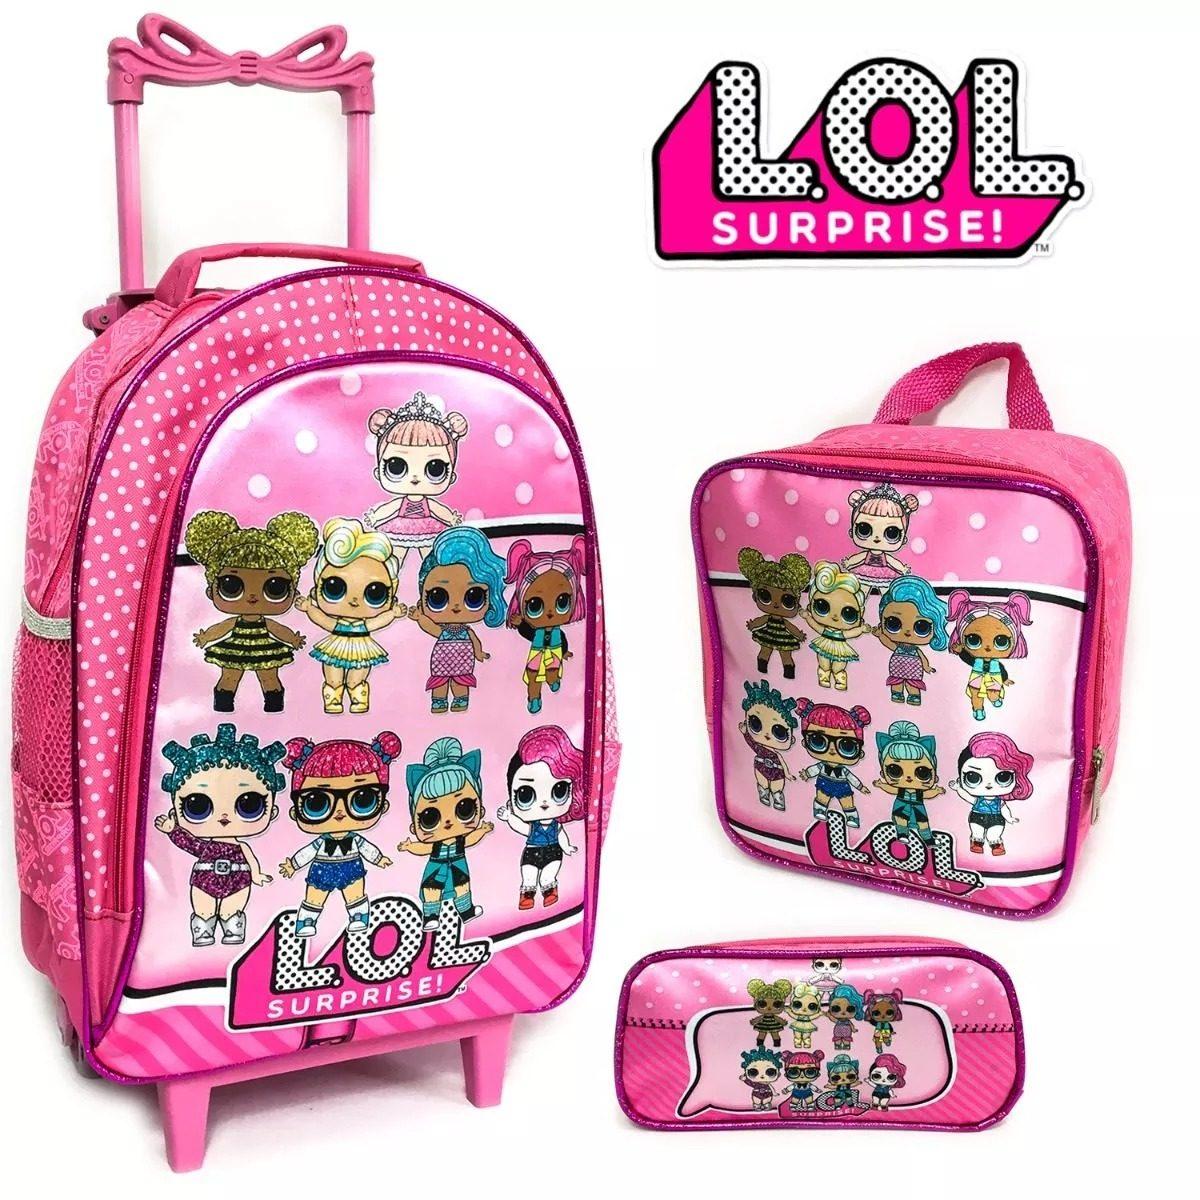 673cf97b70 kit mochila infantil rodinha lol surprise 2019 linda bela fe. Carregando  zoom.